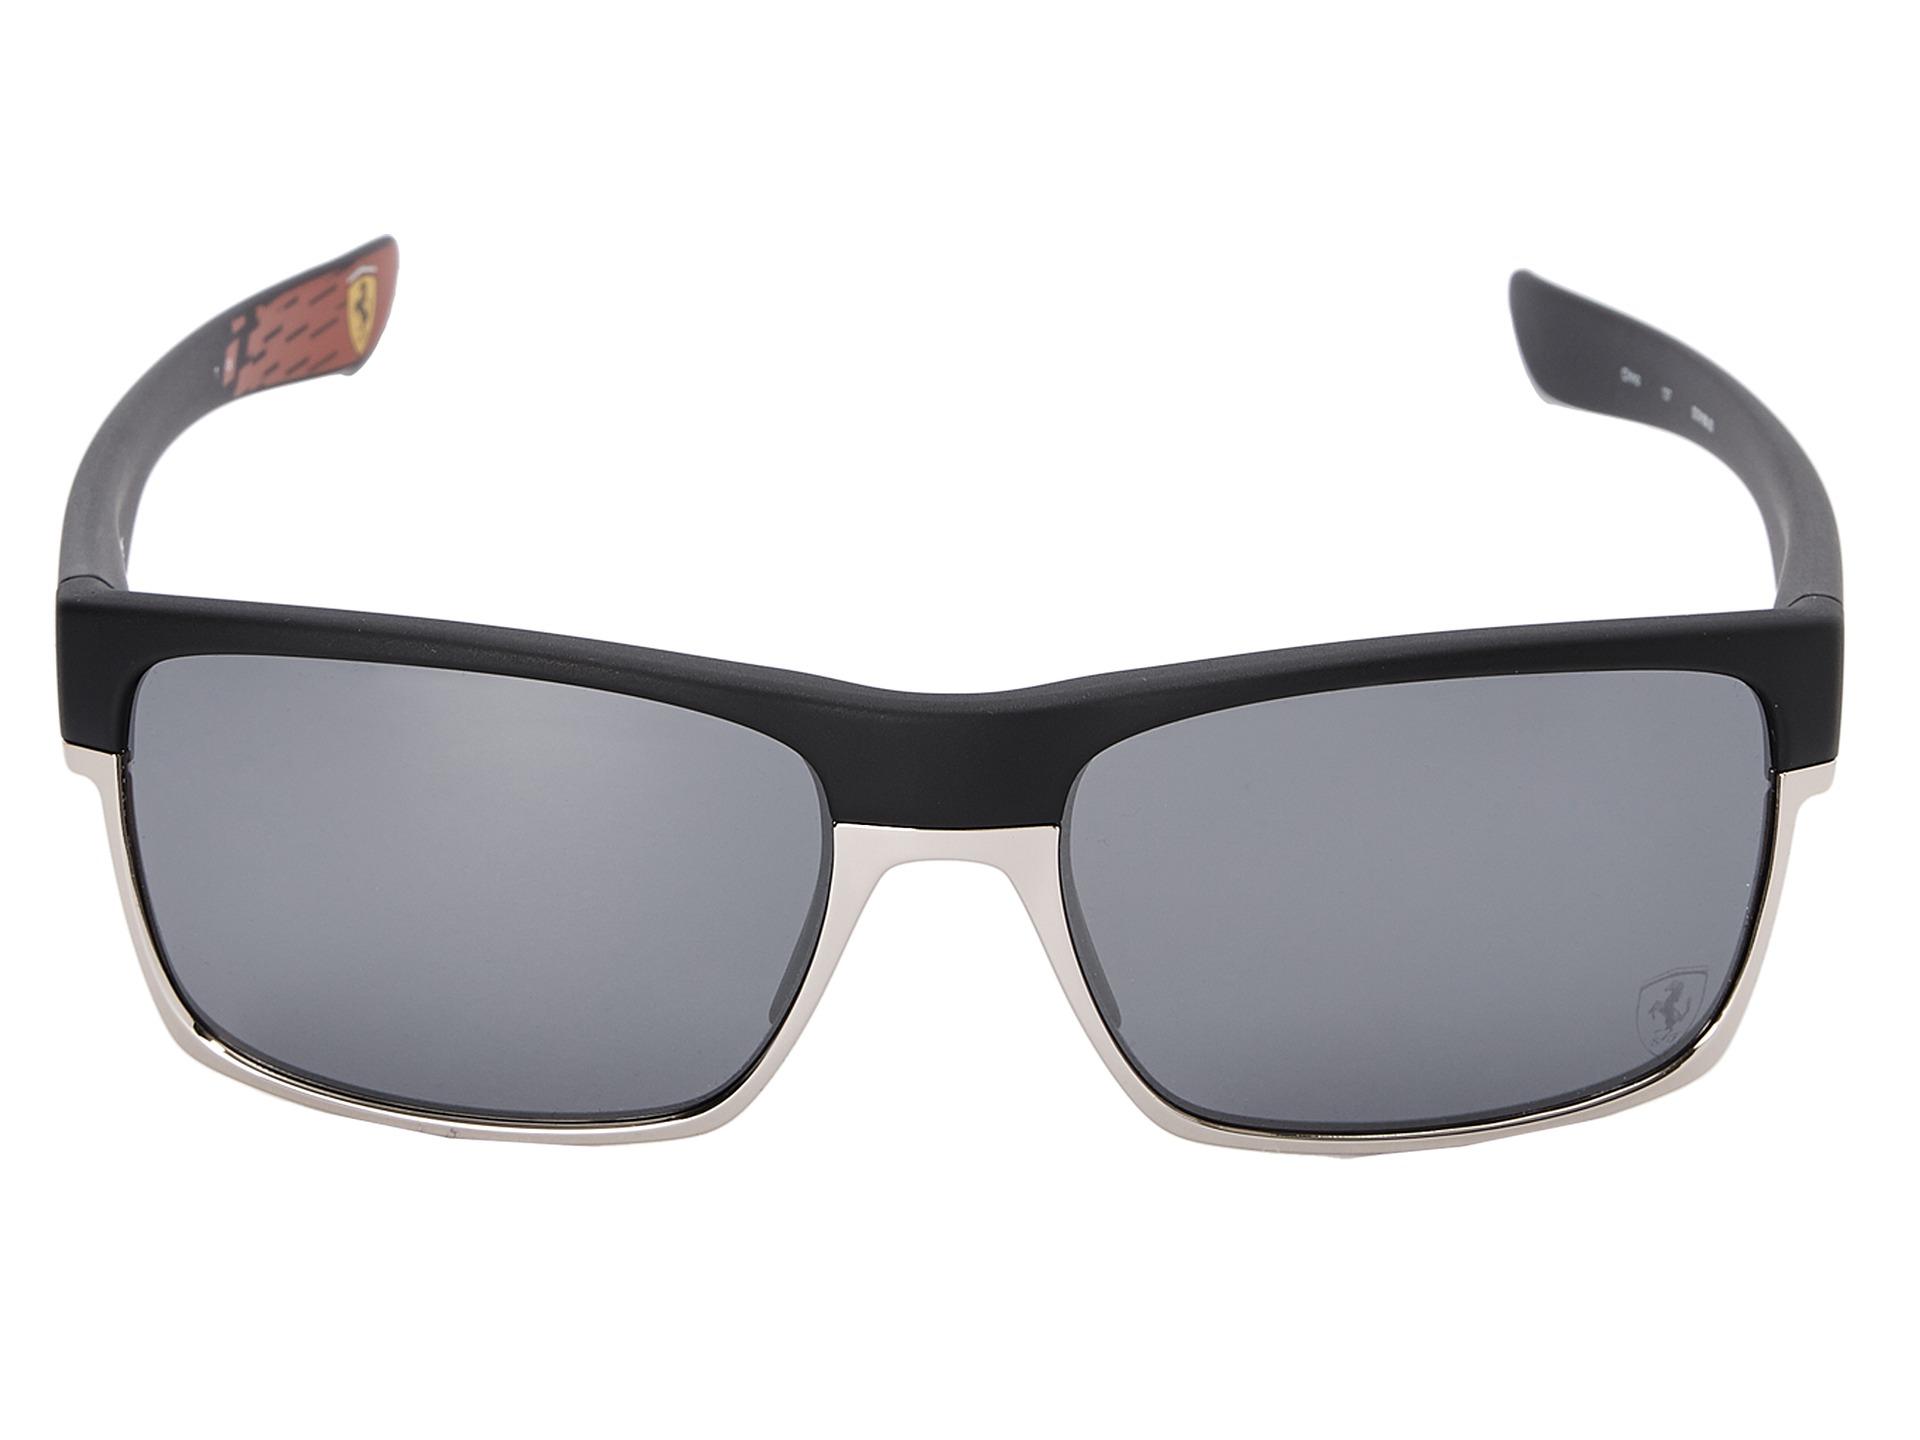 60edbf62d8 Oakley Disguise Reviews « Heritage Malta